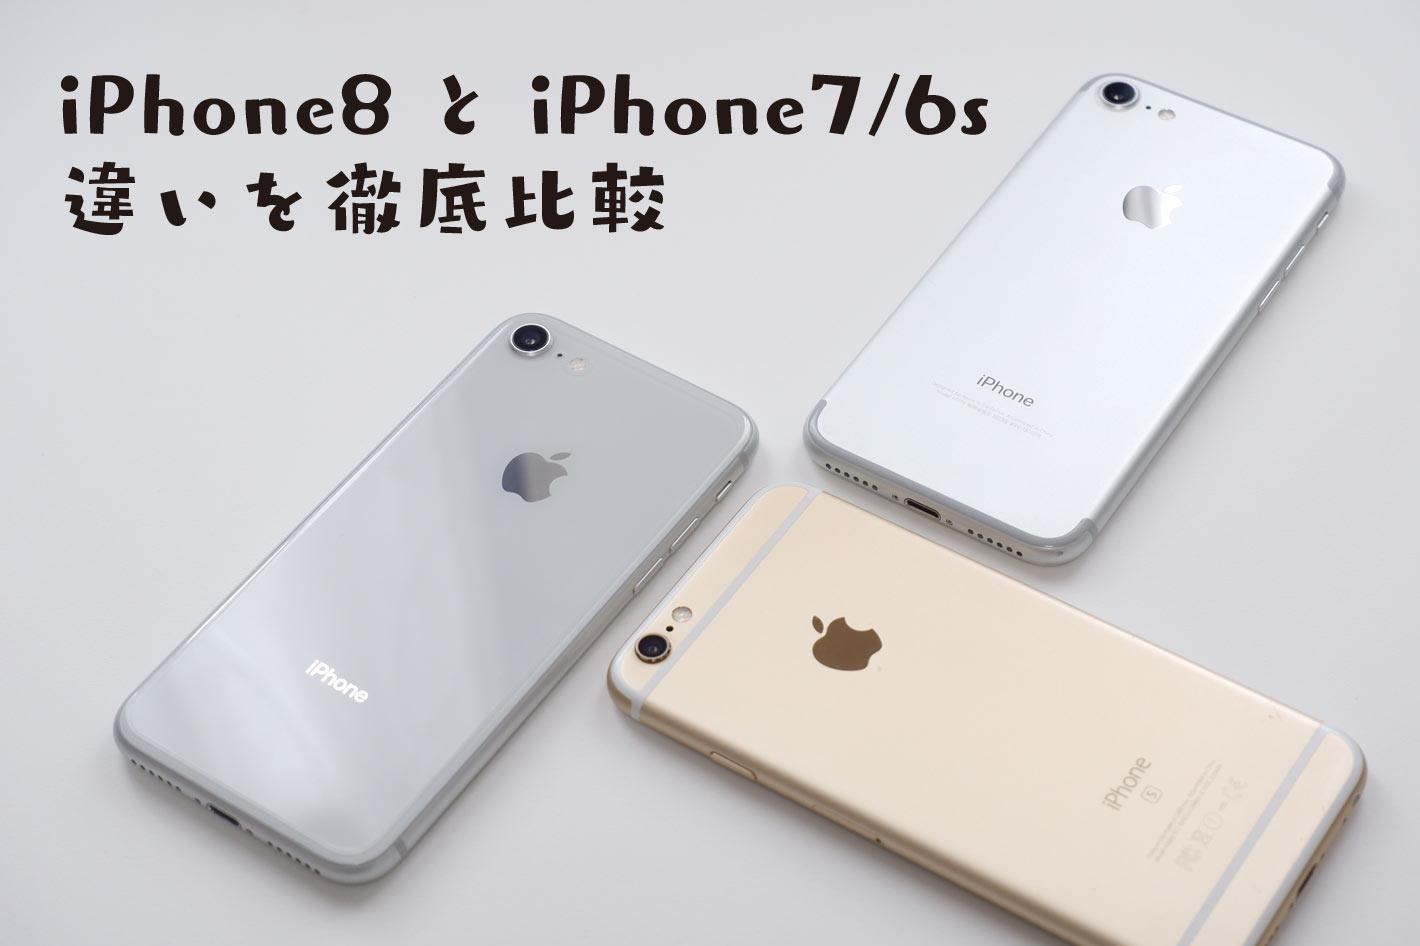 iPhone 8とiPhone 7/6sの違いを徹底比較